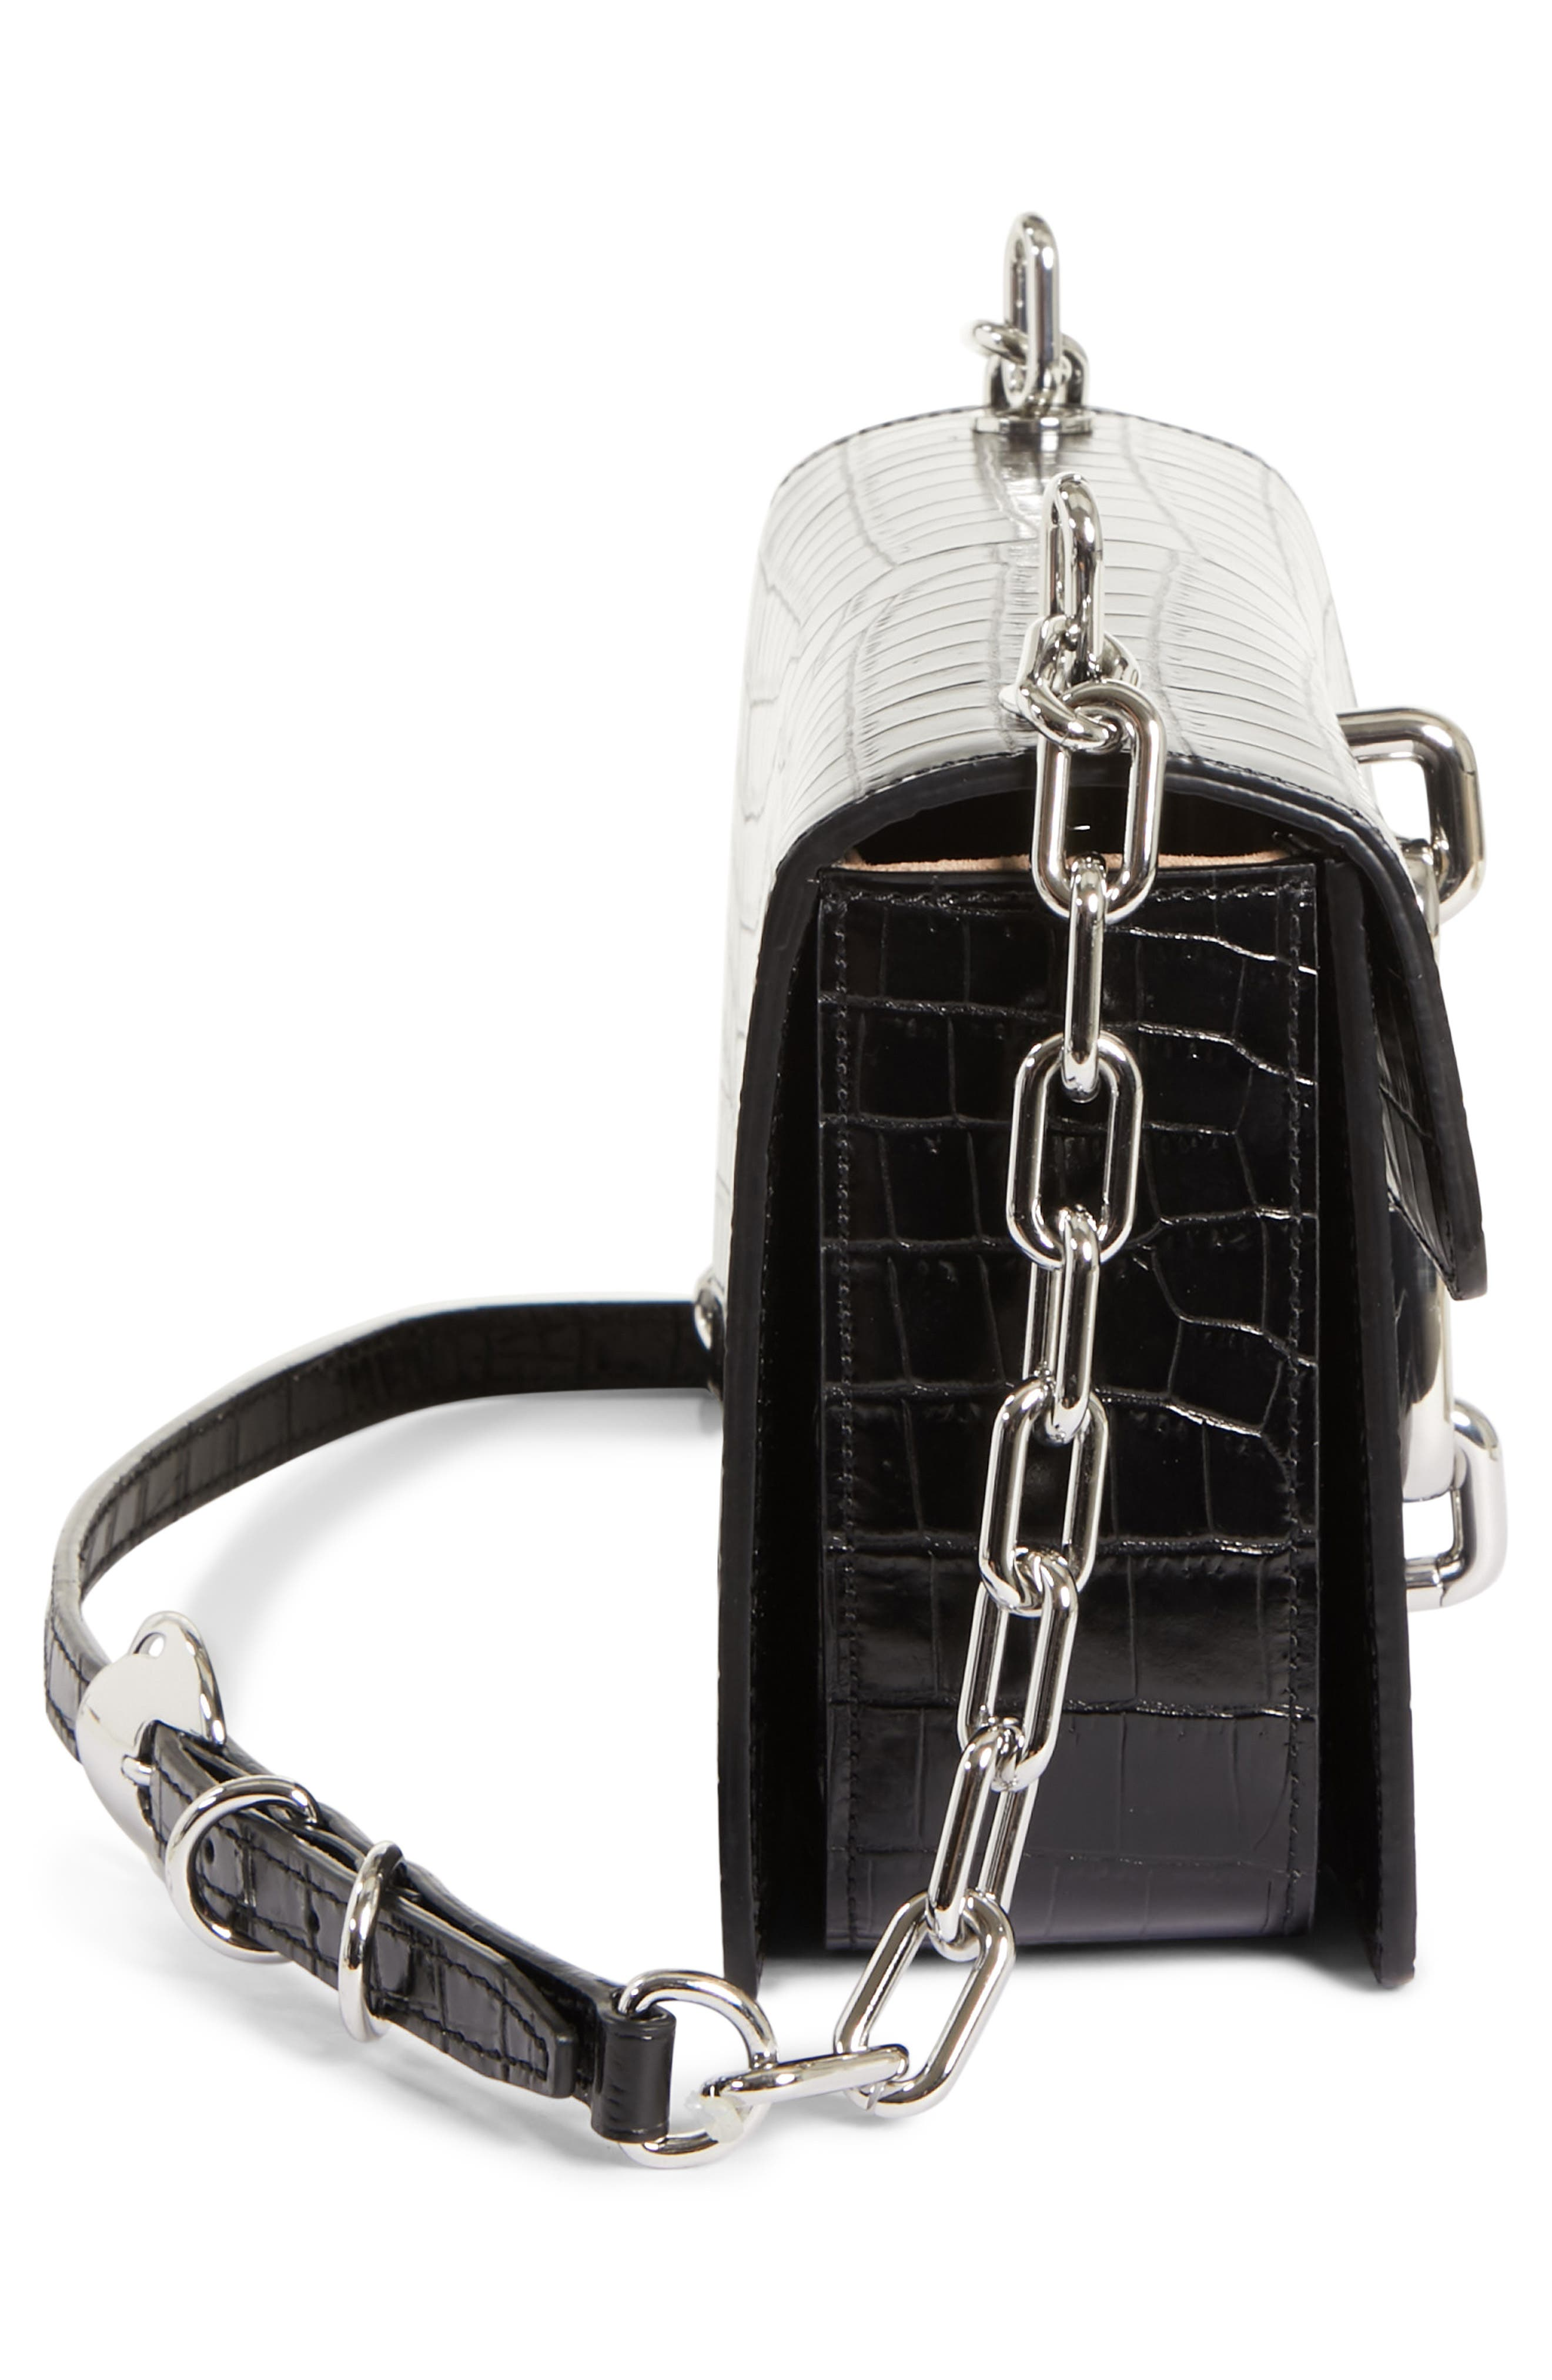 Hook Medium Leather Shoulder/Crossbody Bag,                             Alternate thumbnail 5, color,                             001